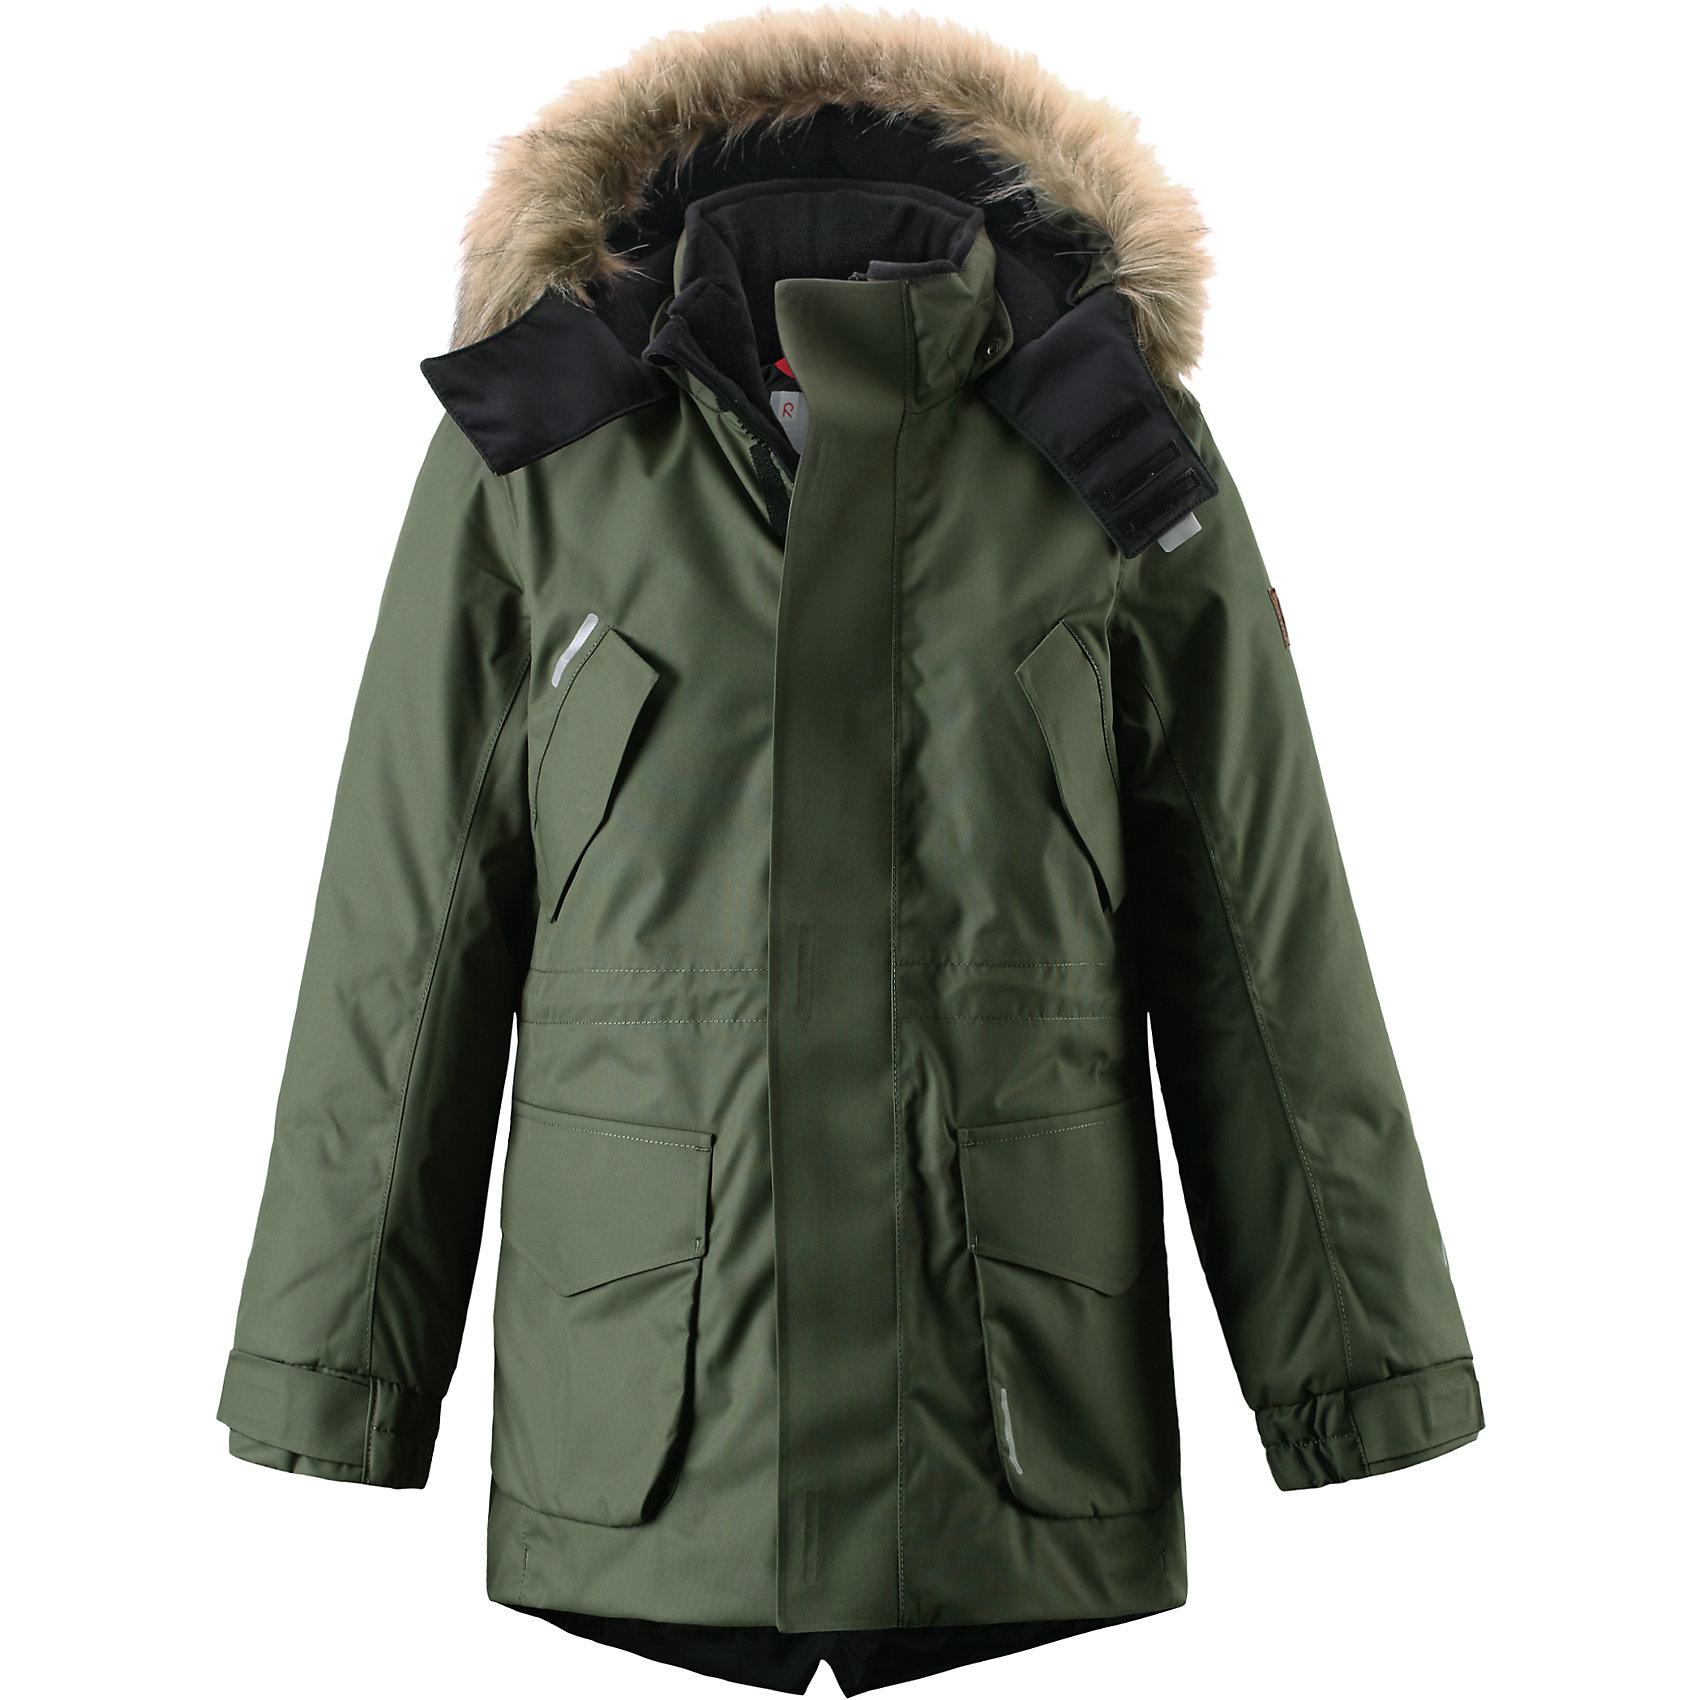 Reima Куртка Naapuri для мальчика Reimatec® Reima reima сапоги slate для мальчика reimatec® reima